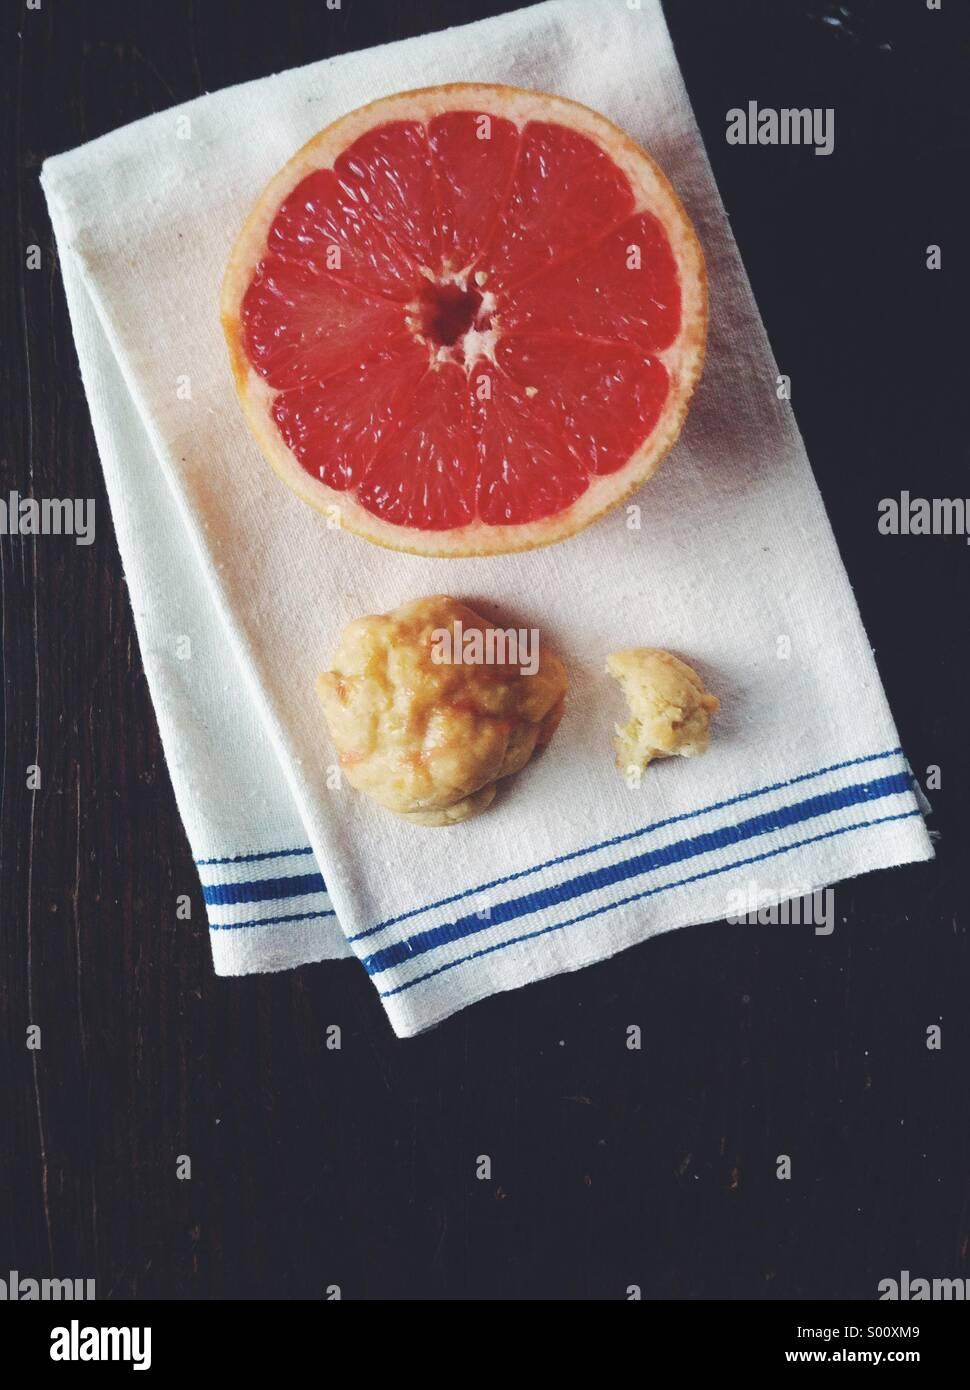 Grapefruit glazed cookies - Stock Image